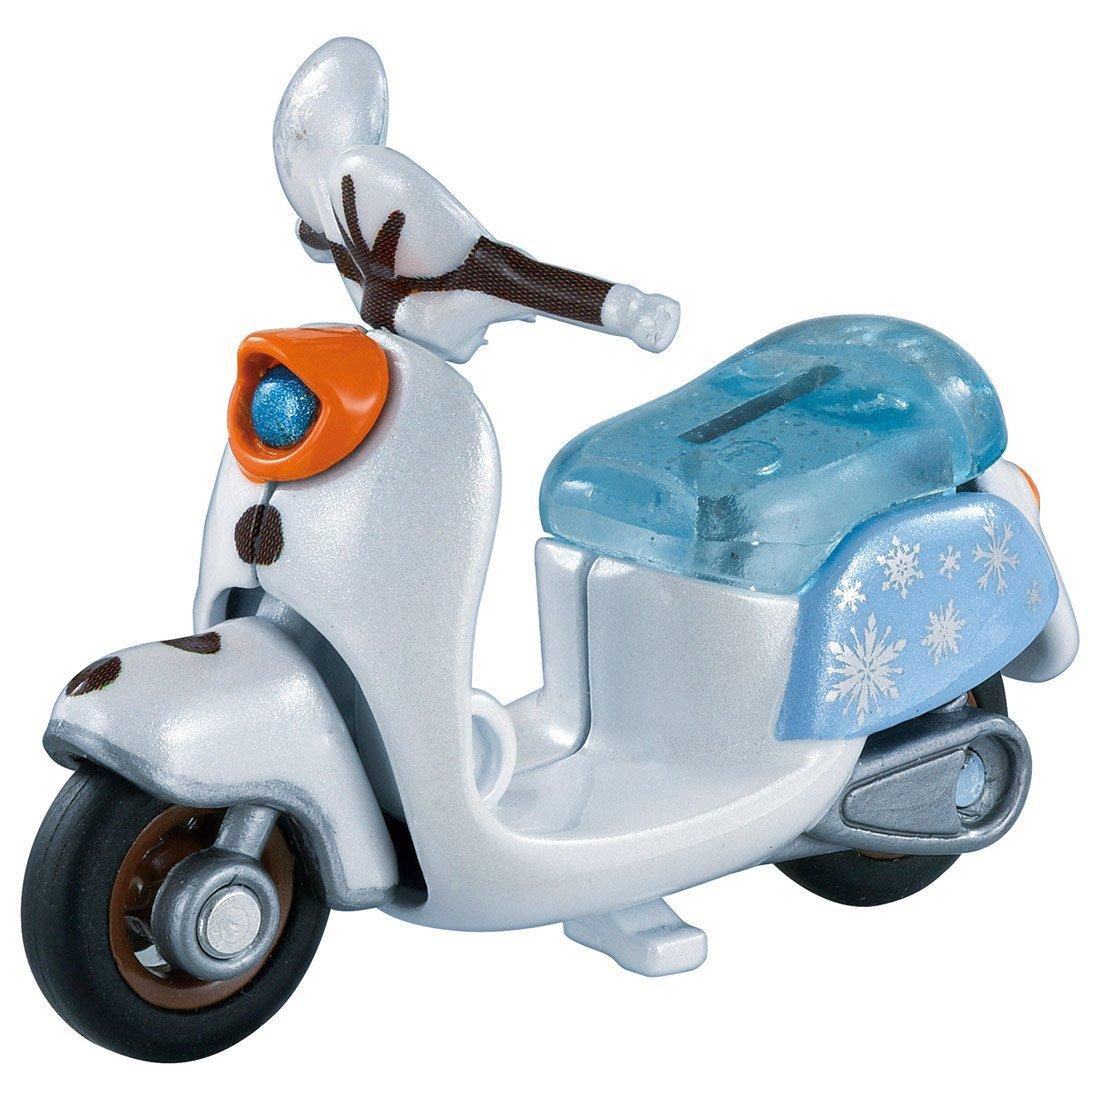 TOMICA 多美迪士尼小汽車 冰雪奇緣2 雪寶摩托車